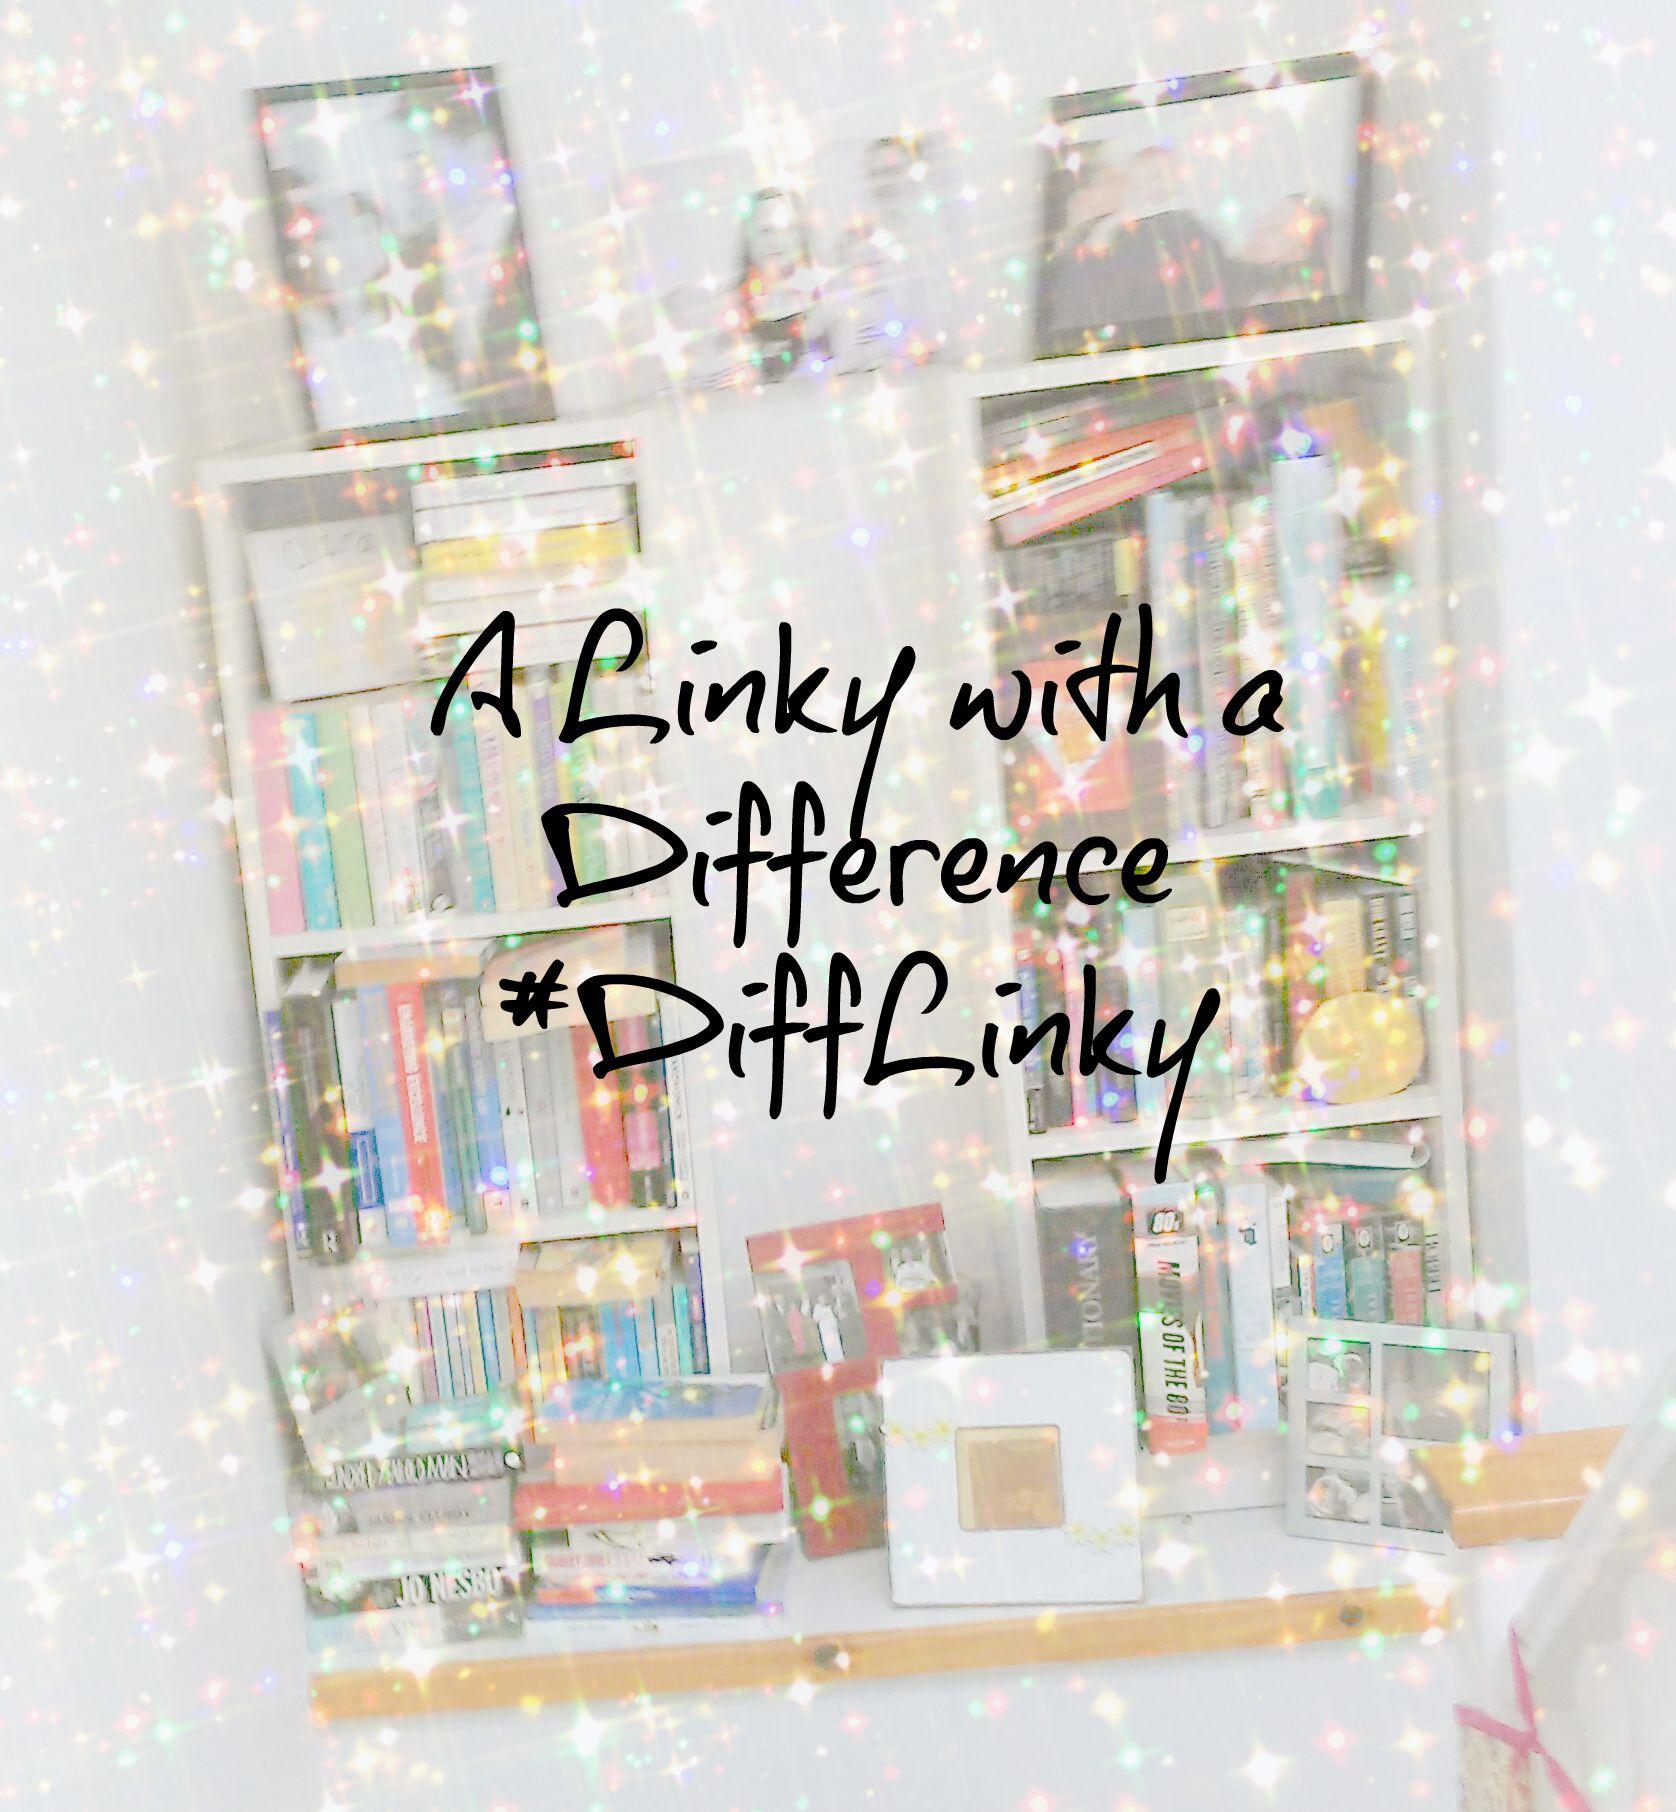 #difflinky